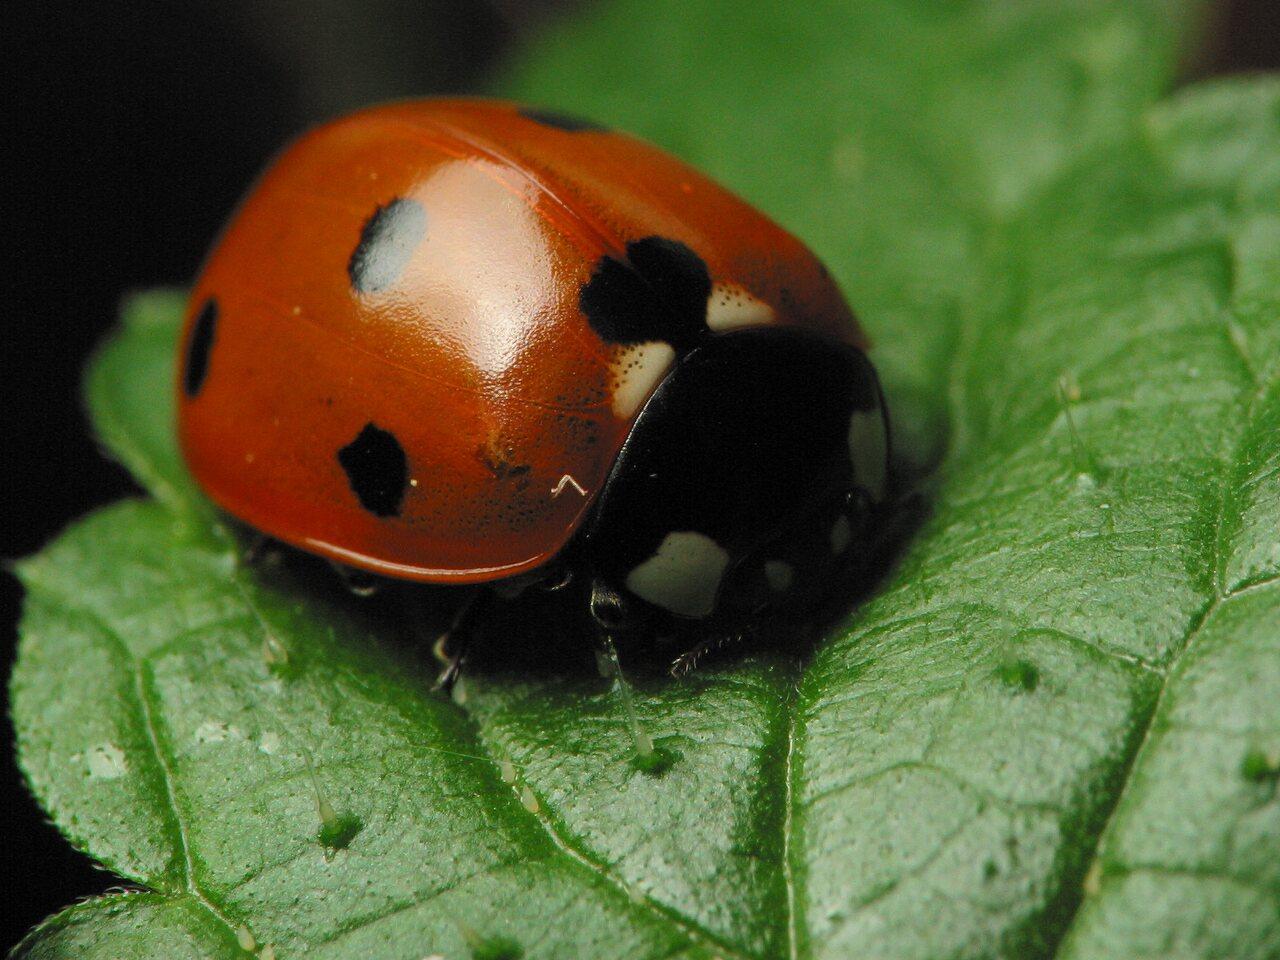 Coccinella-septempunctata-3438.jpg